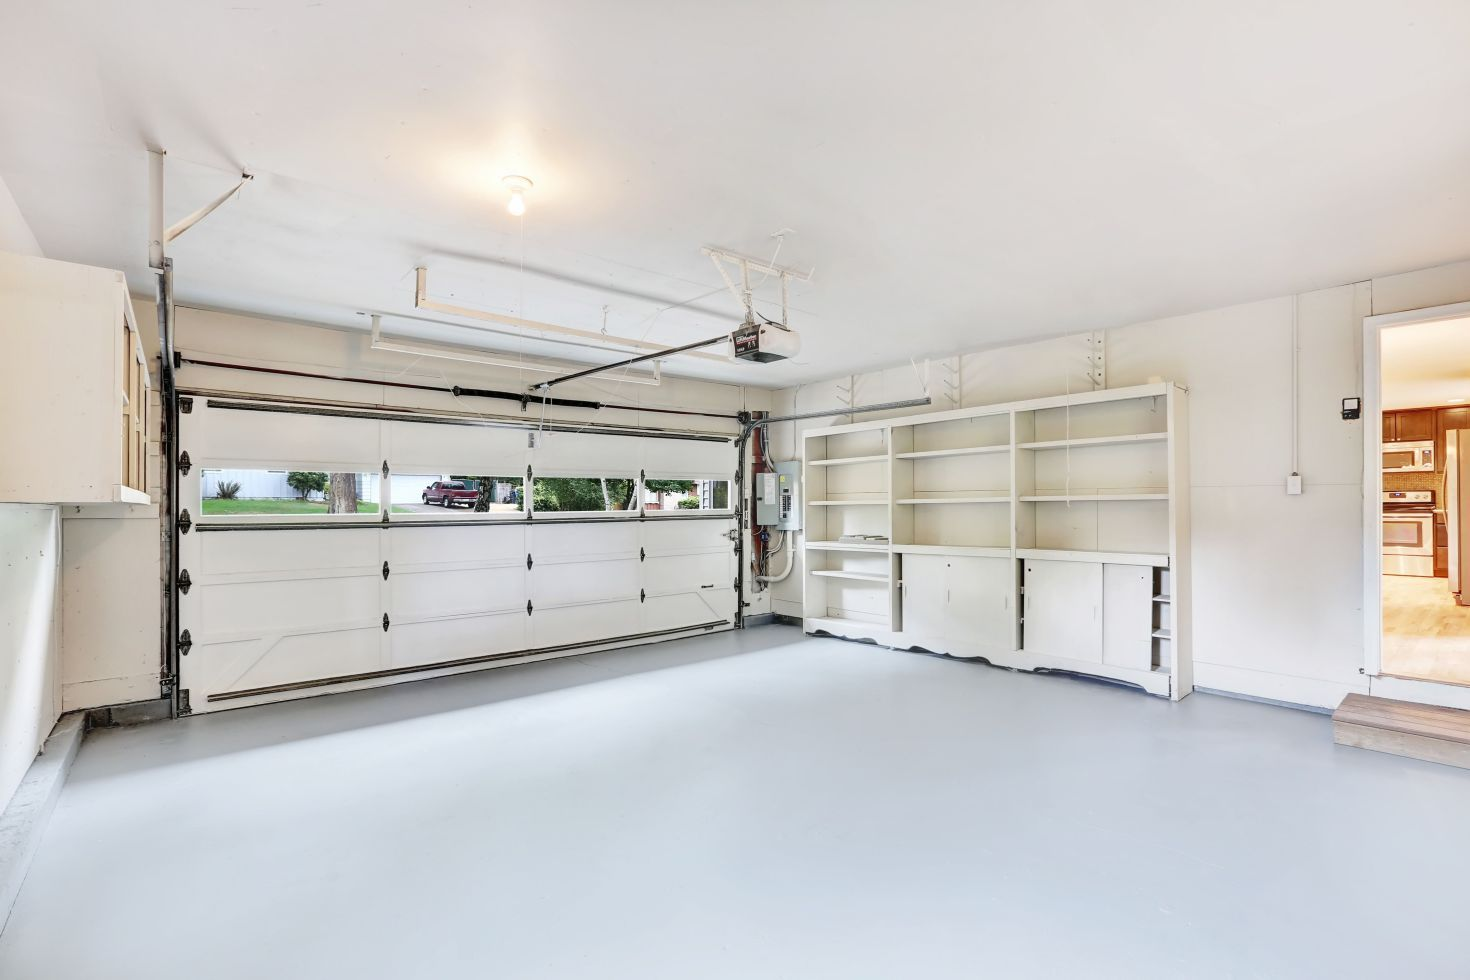 30 Most Interesting Garage Remodel Ideas For Best Inspiration